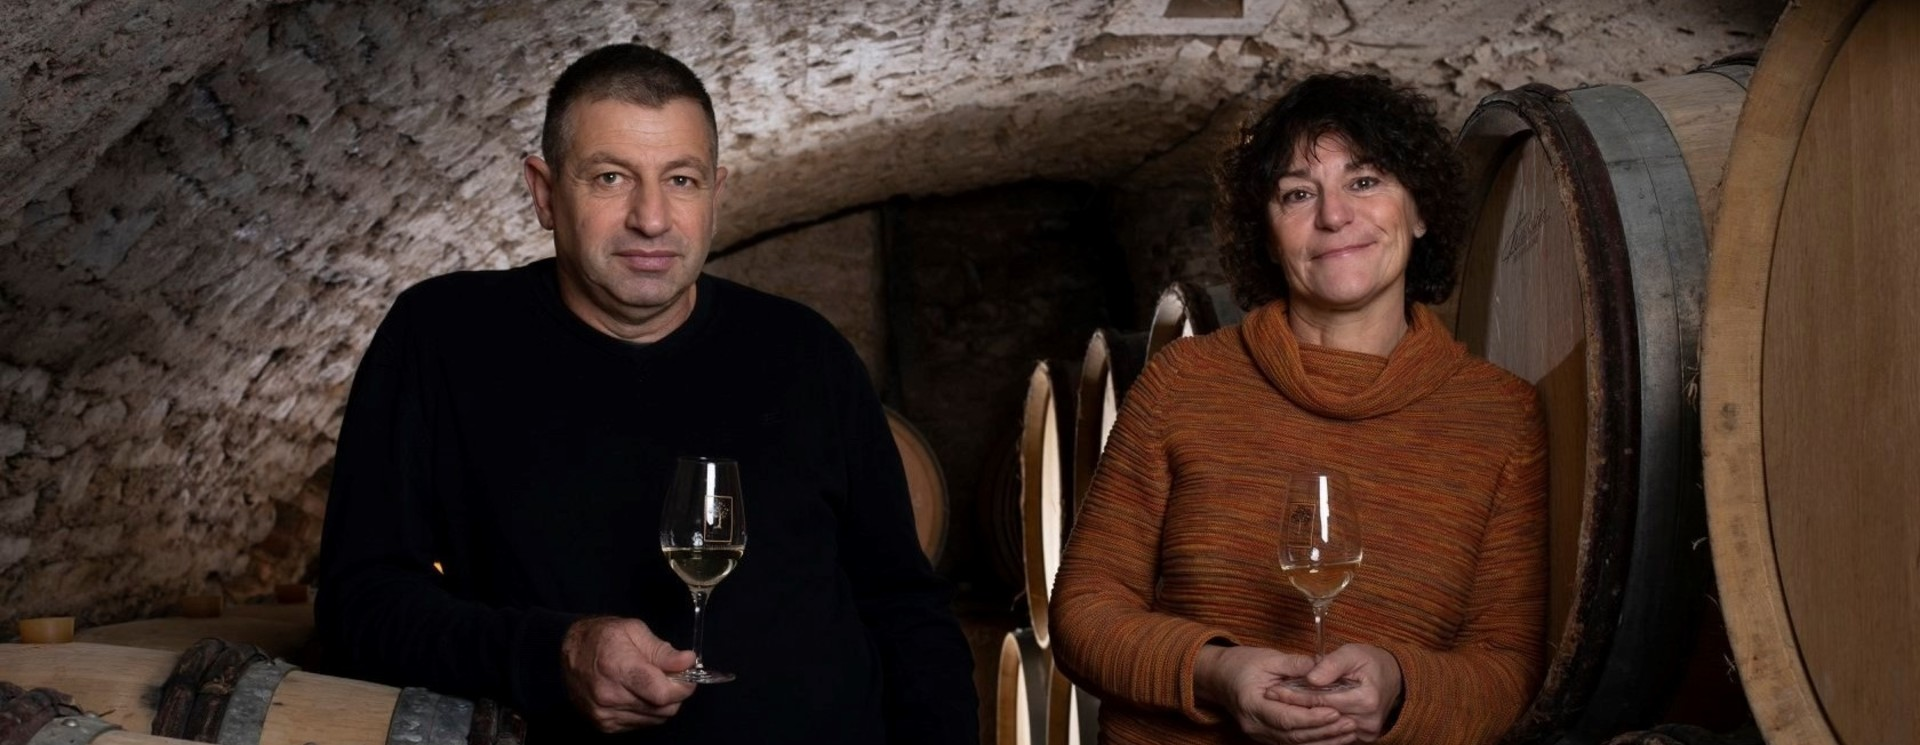 Isabelle et Dennis Pommier